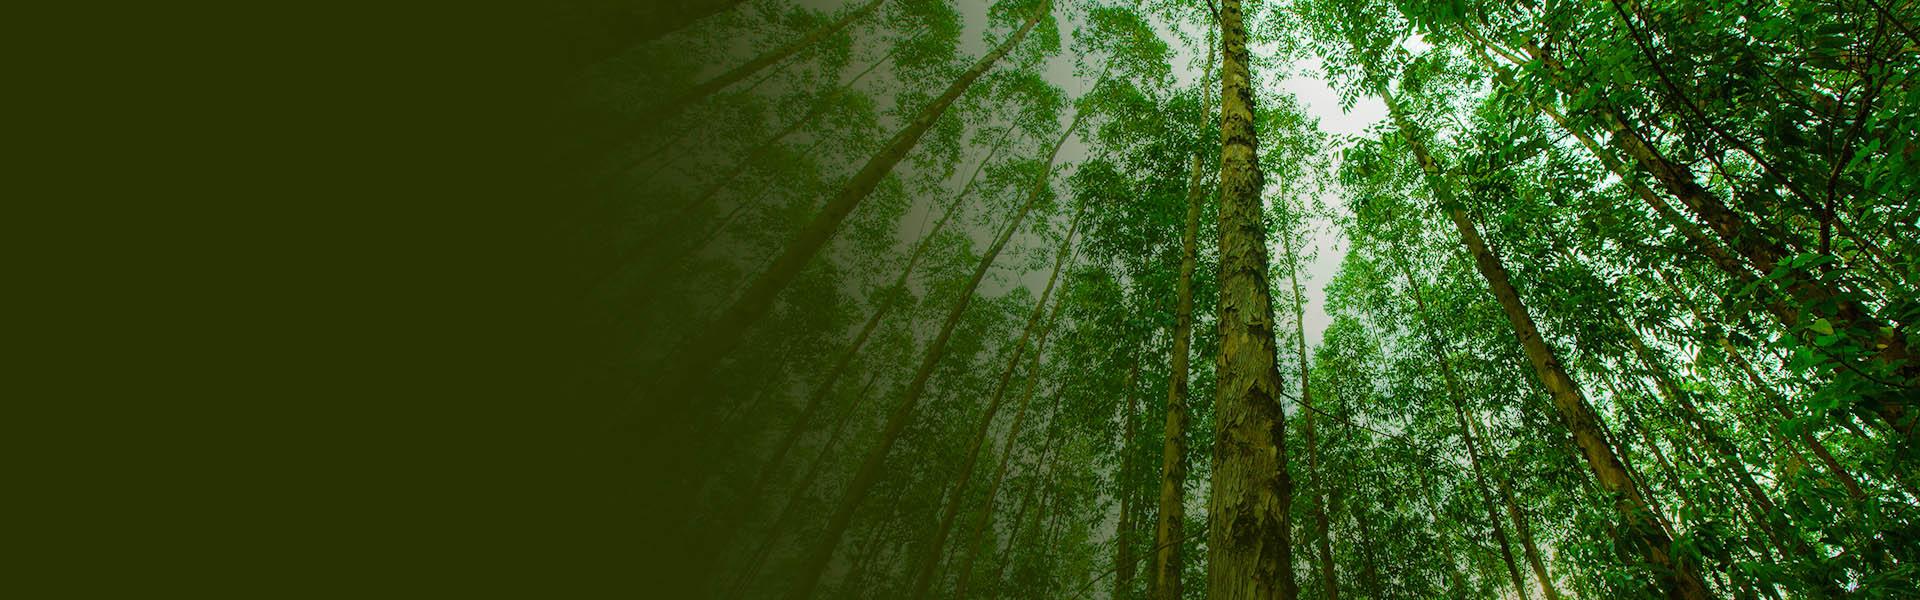 arvores grandes com folhas verdes